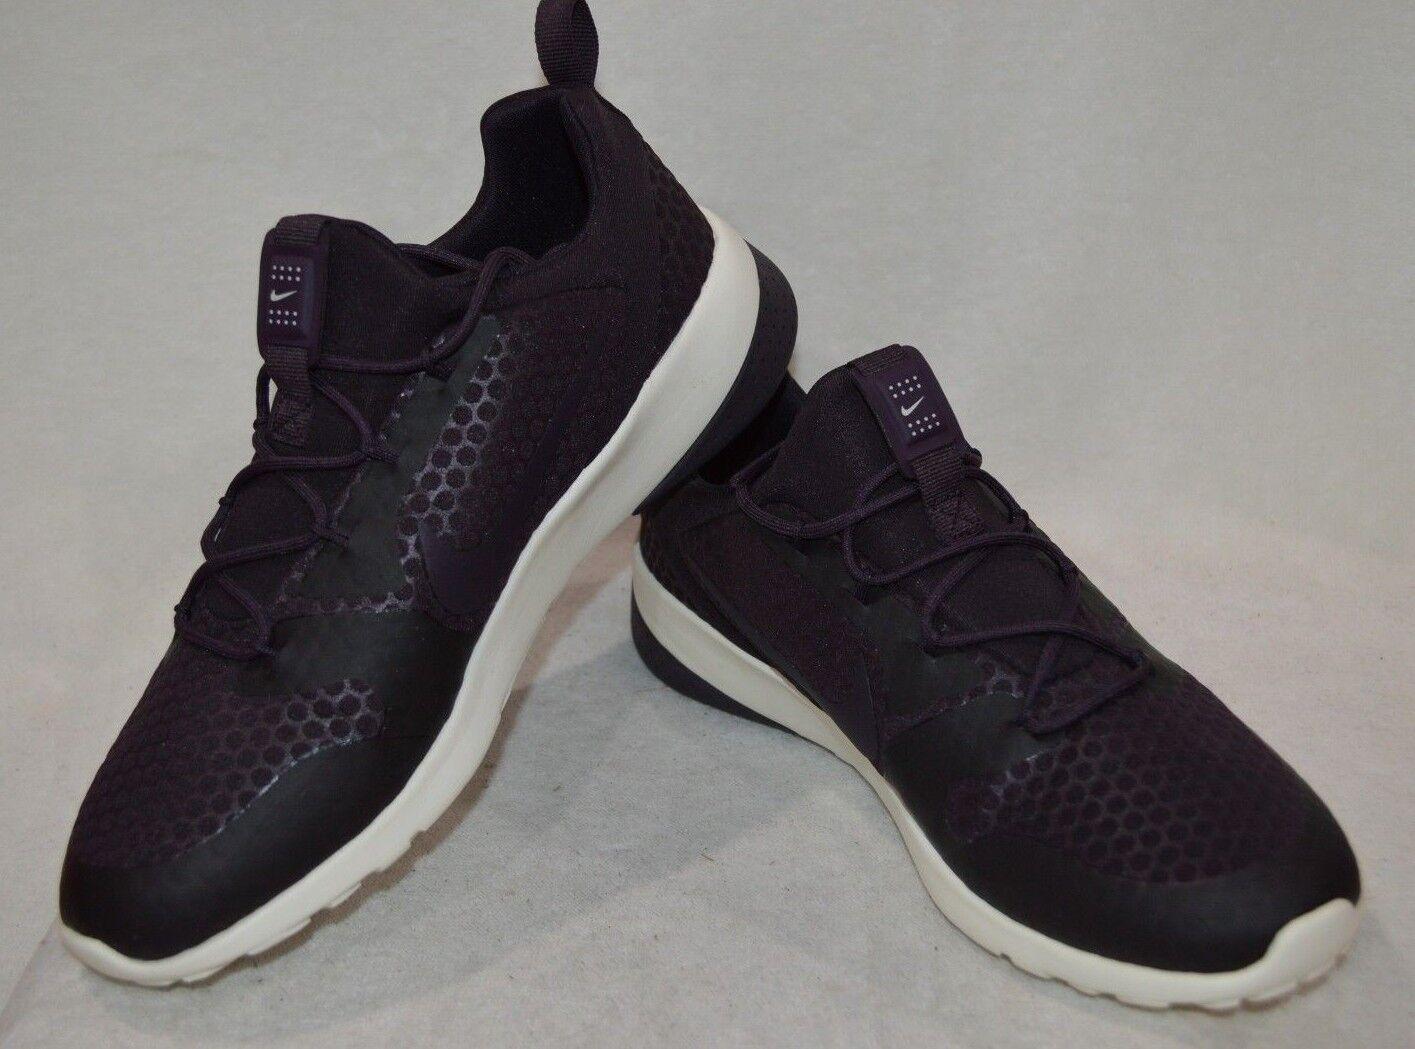 Nike Ck Racer Puerto vino/Vela Para Mujer Zapatos 916792-602 Para Correr-tamaños surtidos NWB 916792-602 Zapatos 5465c1